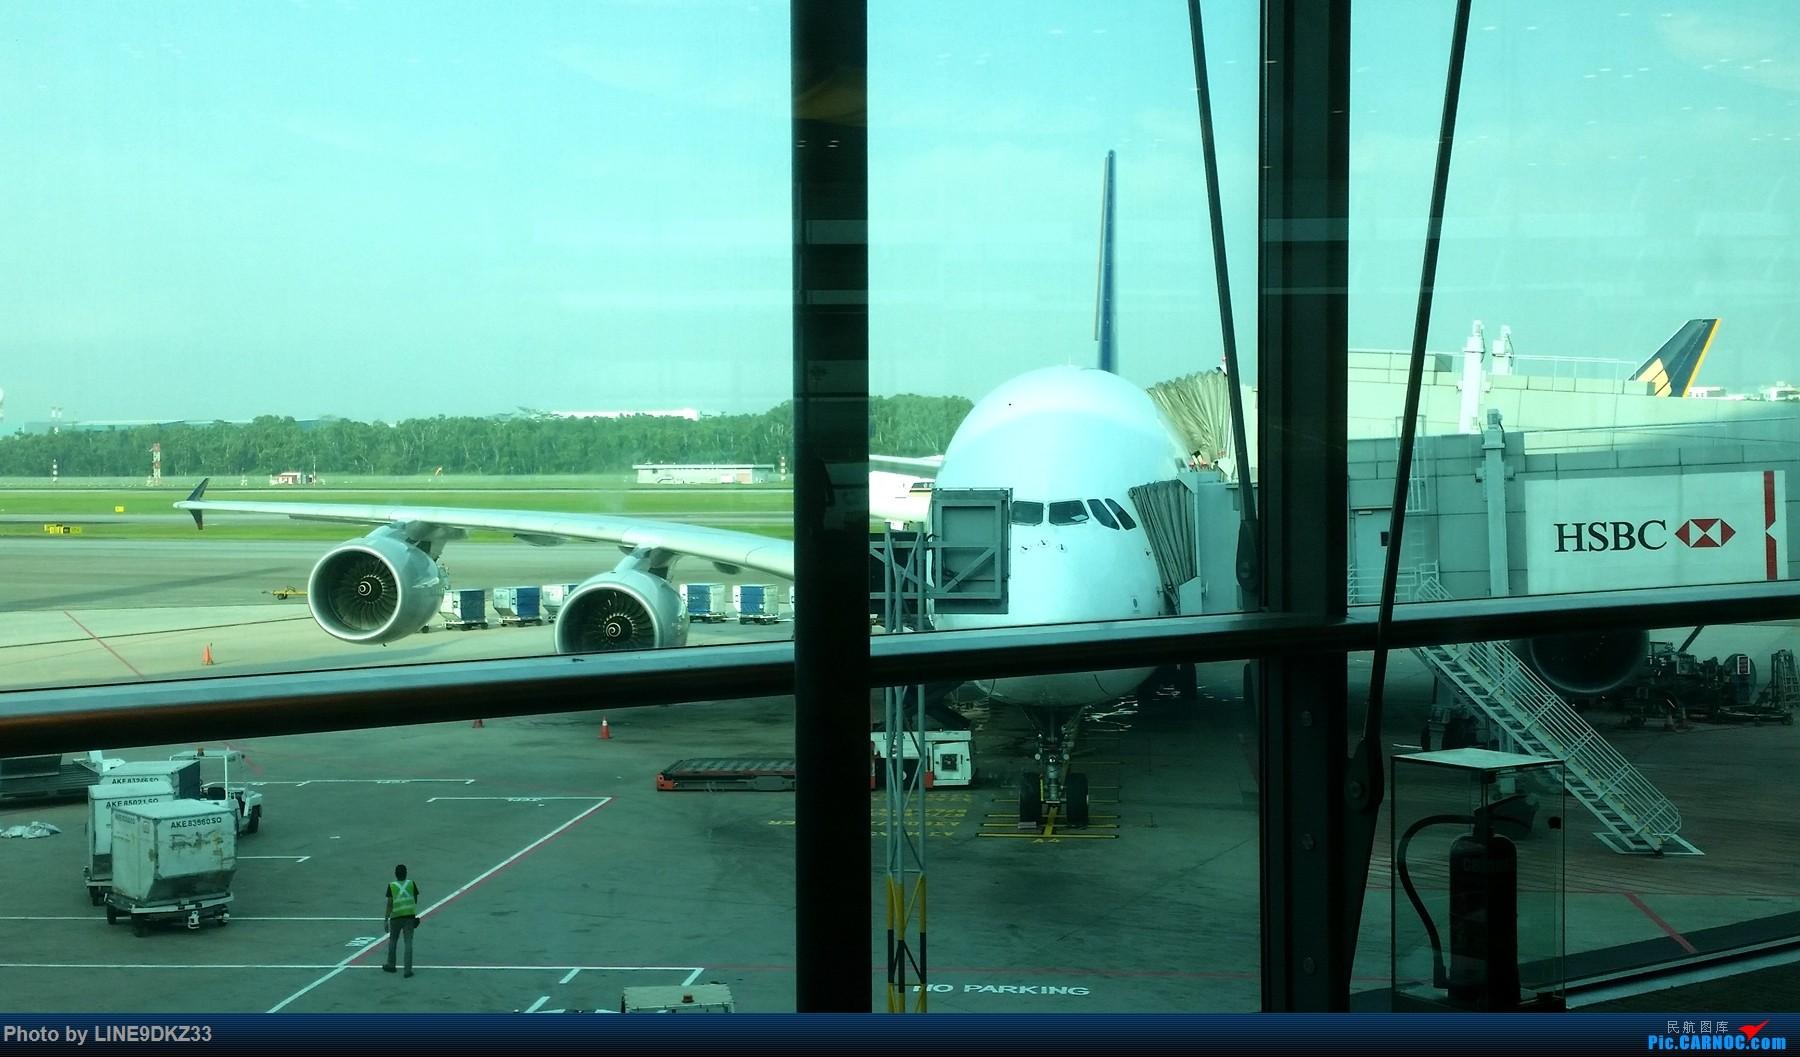 Re:[原创]东南亚运转(下) 空中客车A380-800 9VSKA 新加坡樟宜机场